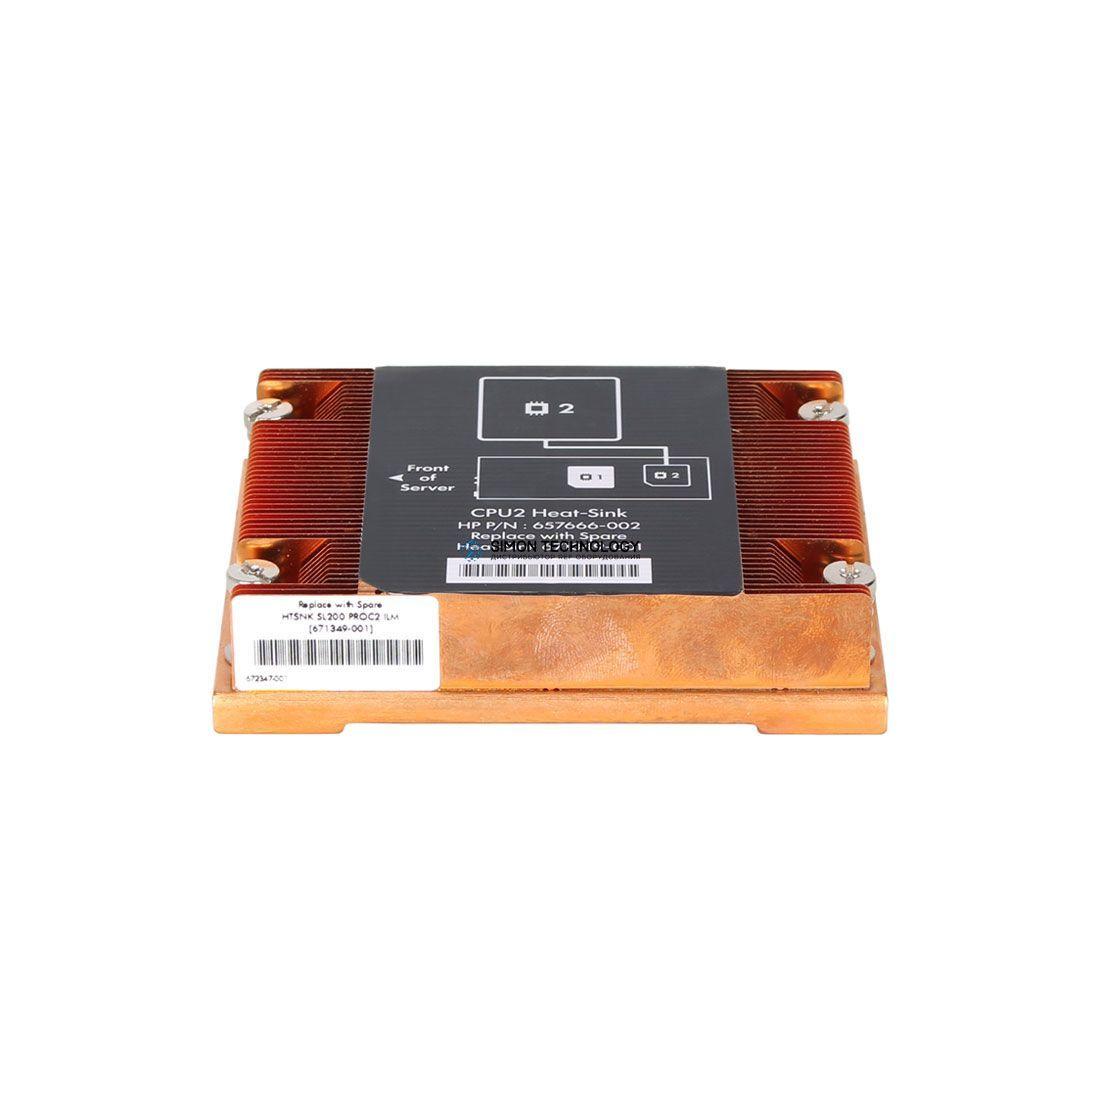 Радиатор HP SL200 SERIES CPU 2 HEATSINK (657666-002)